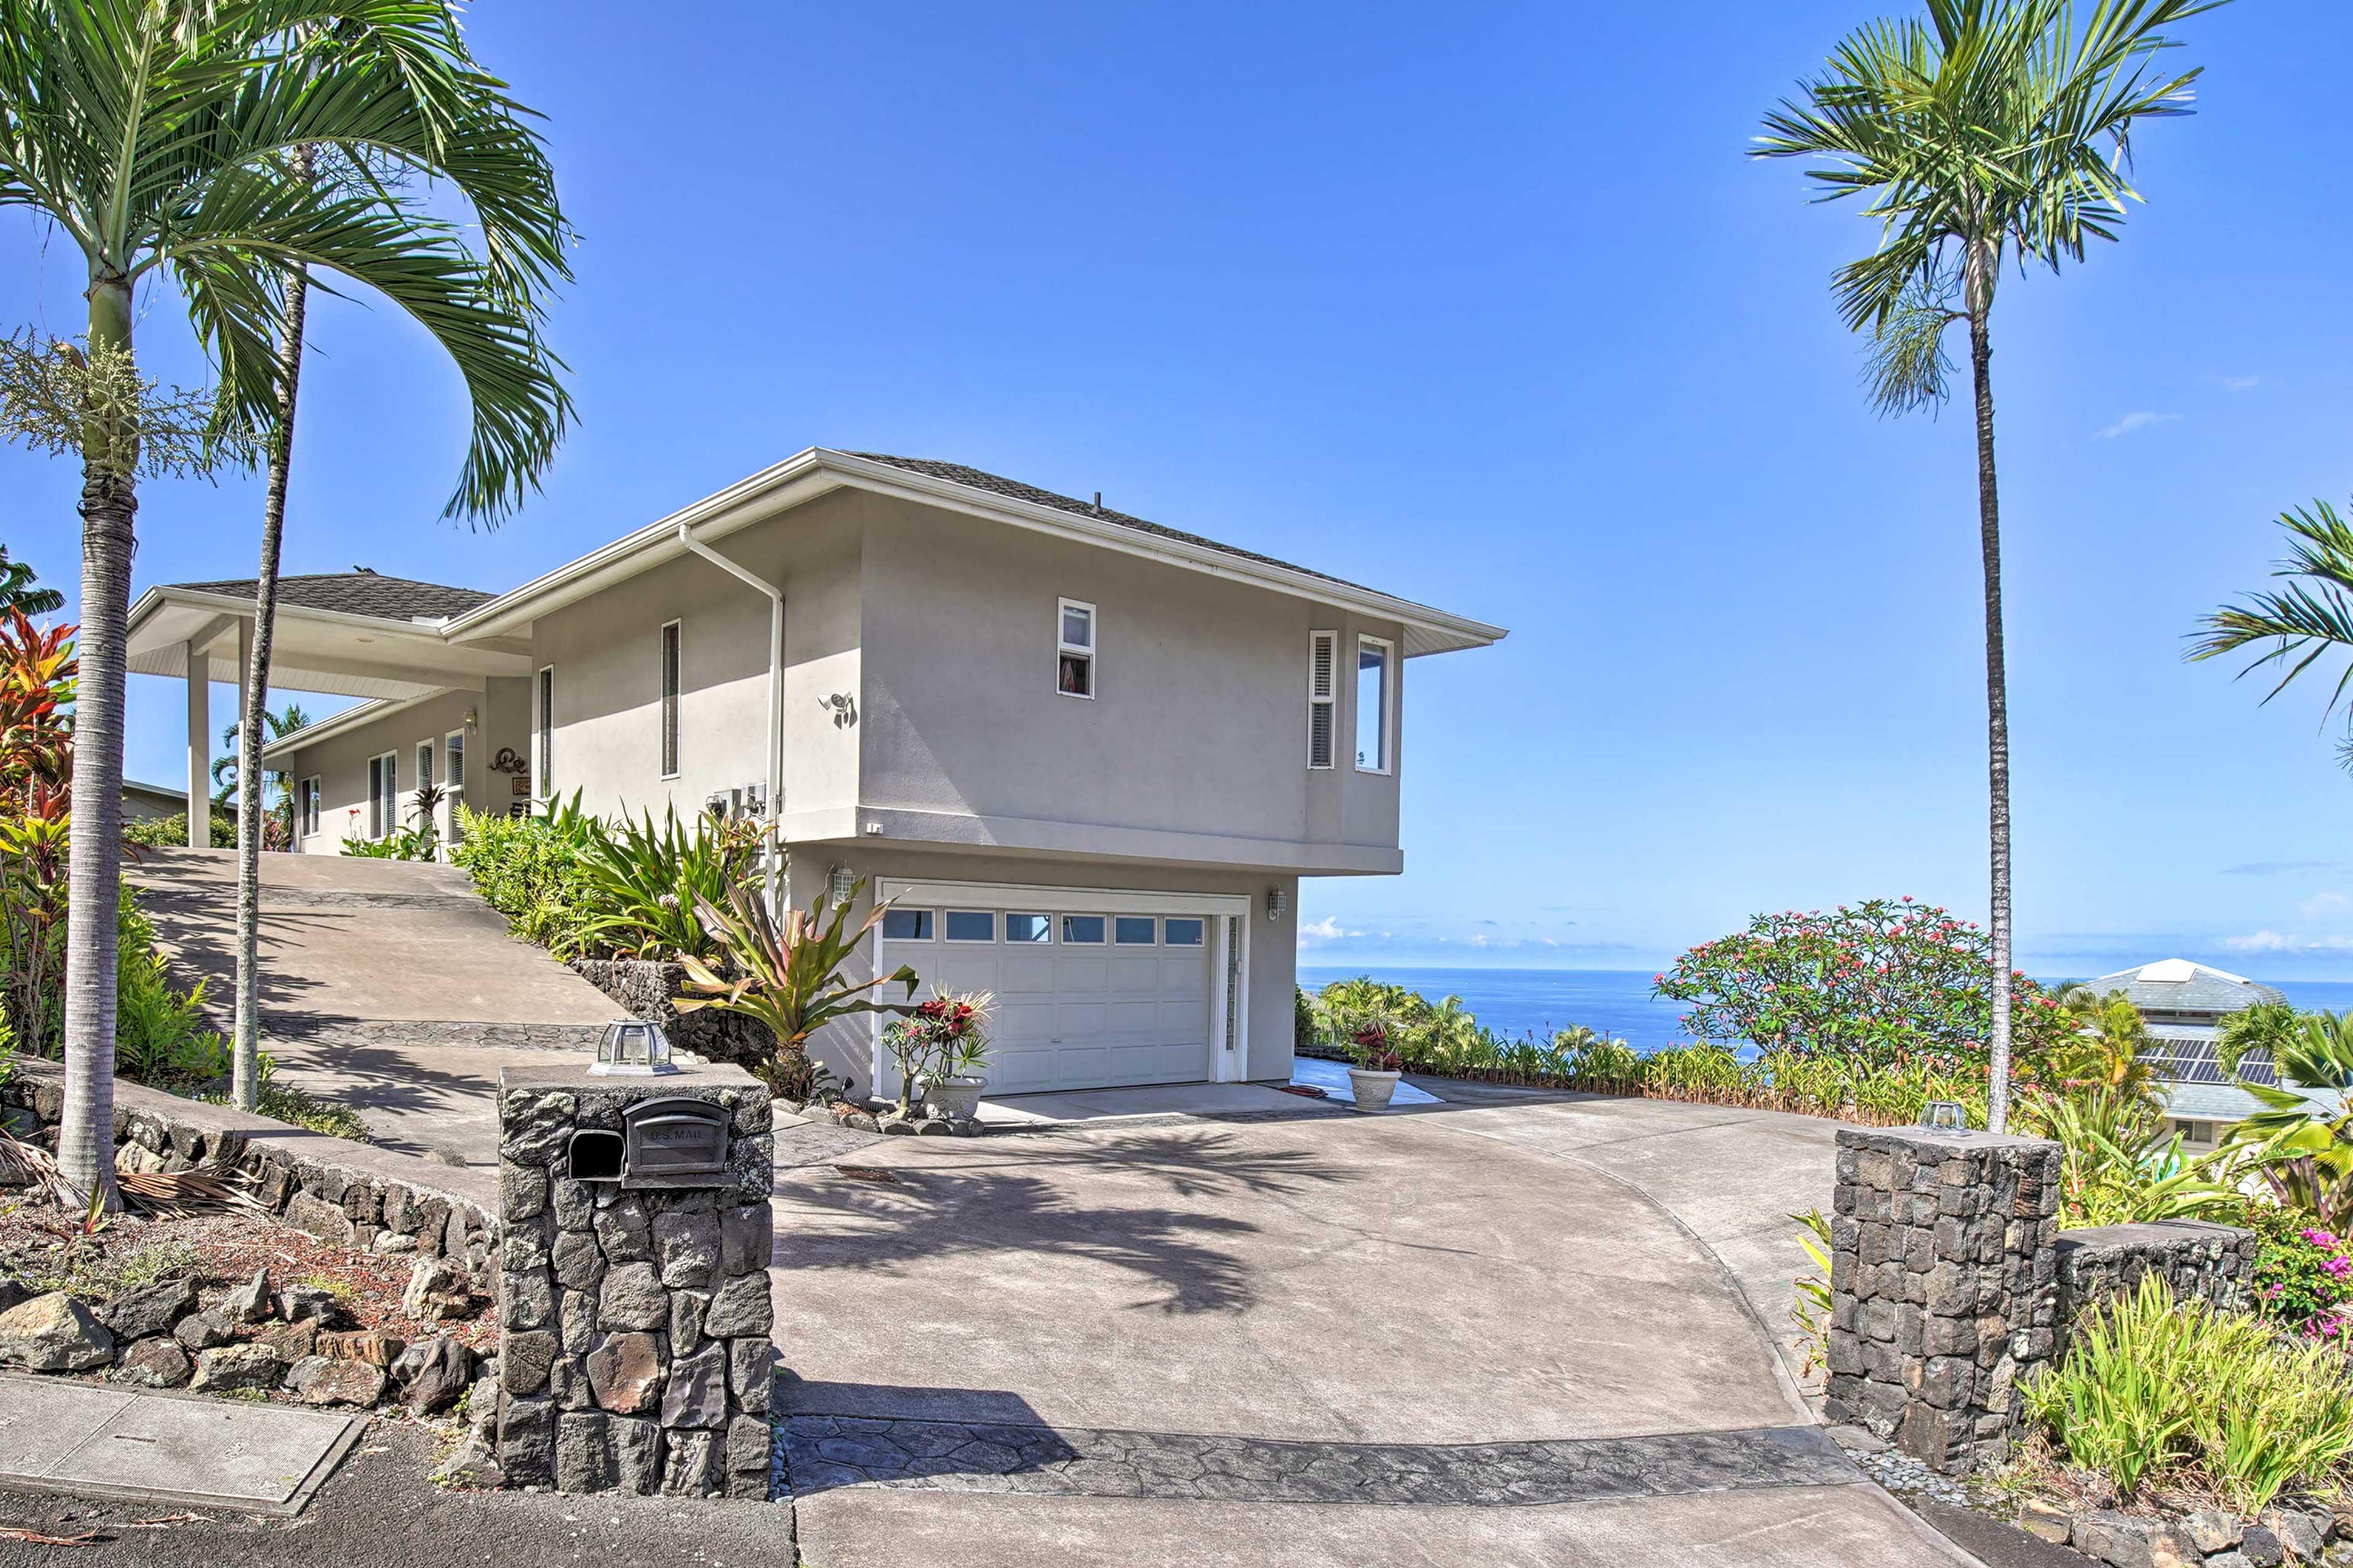 Say 'Aloha' to paradise at this 3-bed, 3-bath Kailua-Kona vacation rental home.